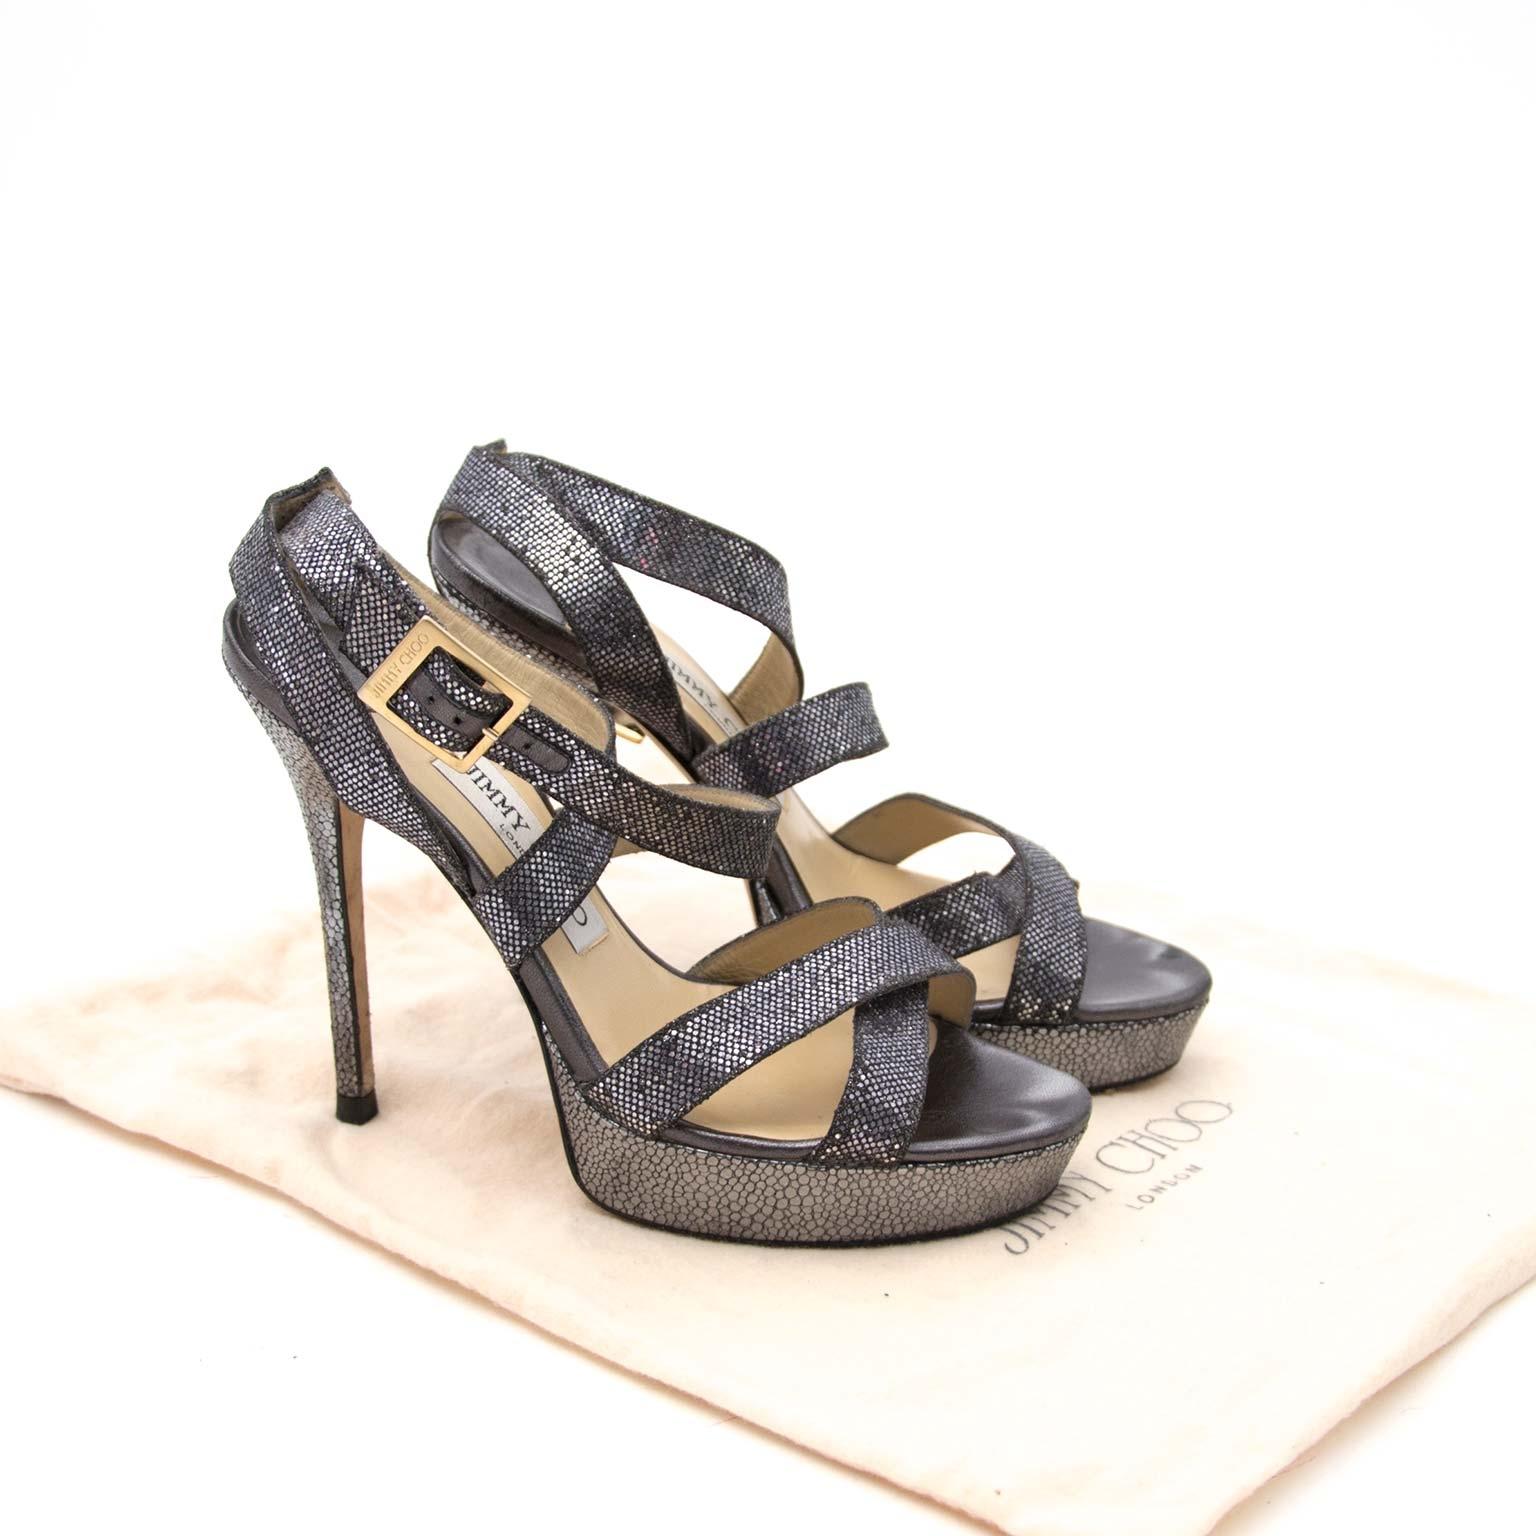 Jimmy Choo 'Vamp' Metallic Platform Heel Sandal - Size 37 Buy authentic designer Jimmy Choo secondhand shoes sandals at Labellov at the best price. Safe and secure shopping. Koop tweedehands authentieke Jimmy Choo schoenen bij designer webwinkel labellov